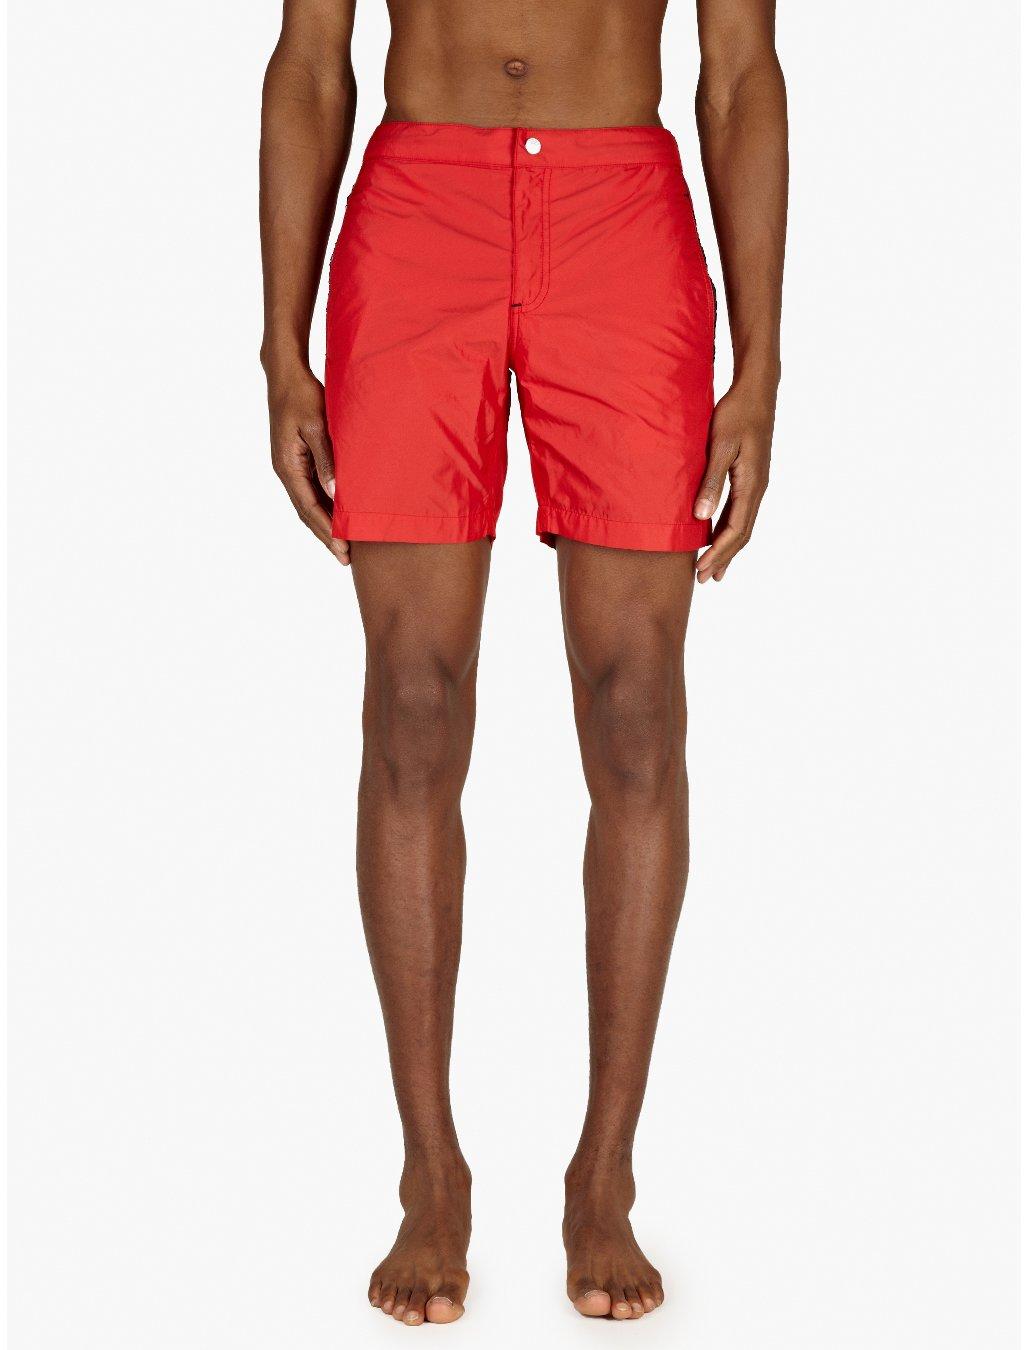 Etiquette Mens Red Ariston Swim Shorts in Red for Men | Lyst